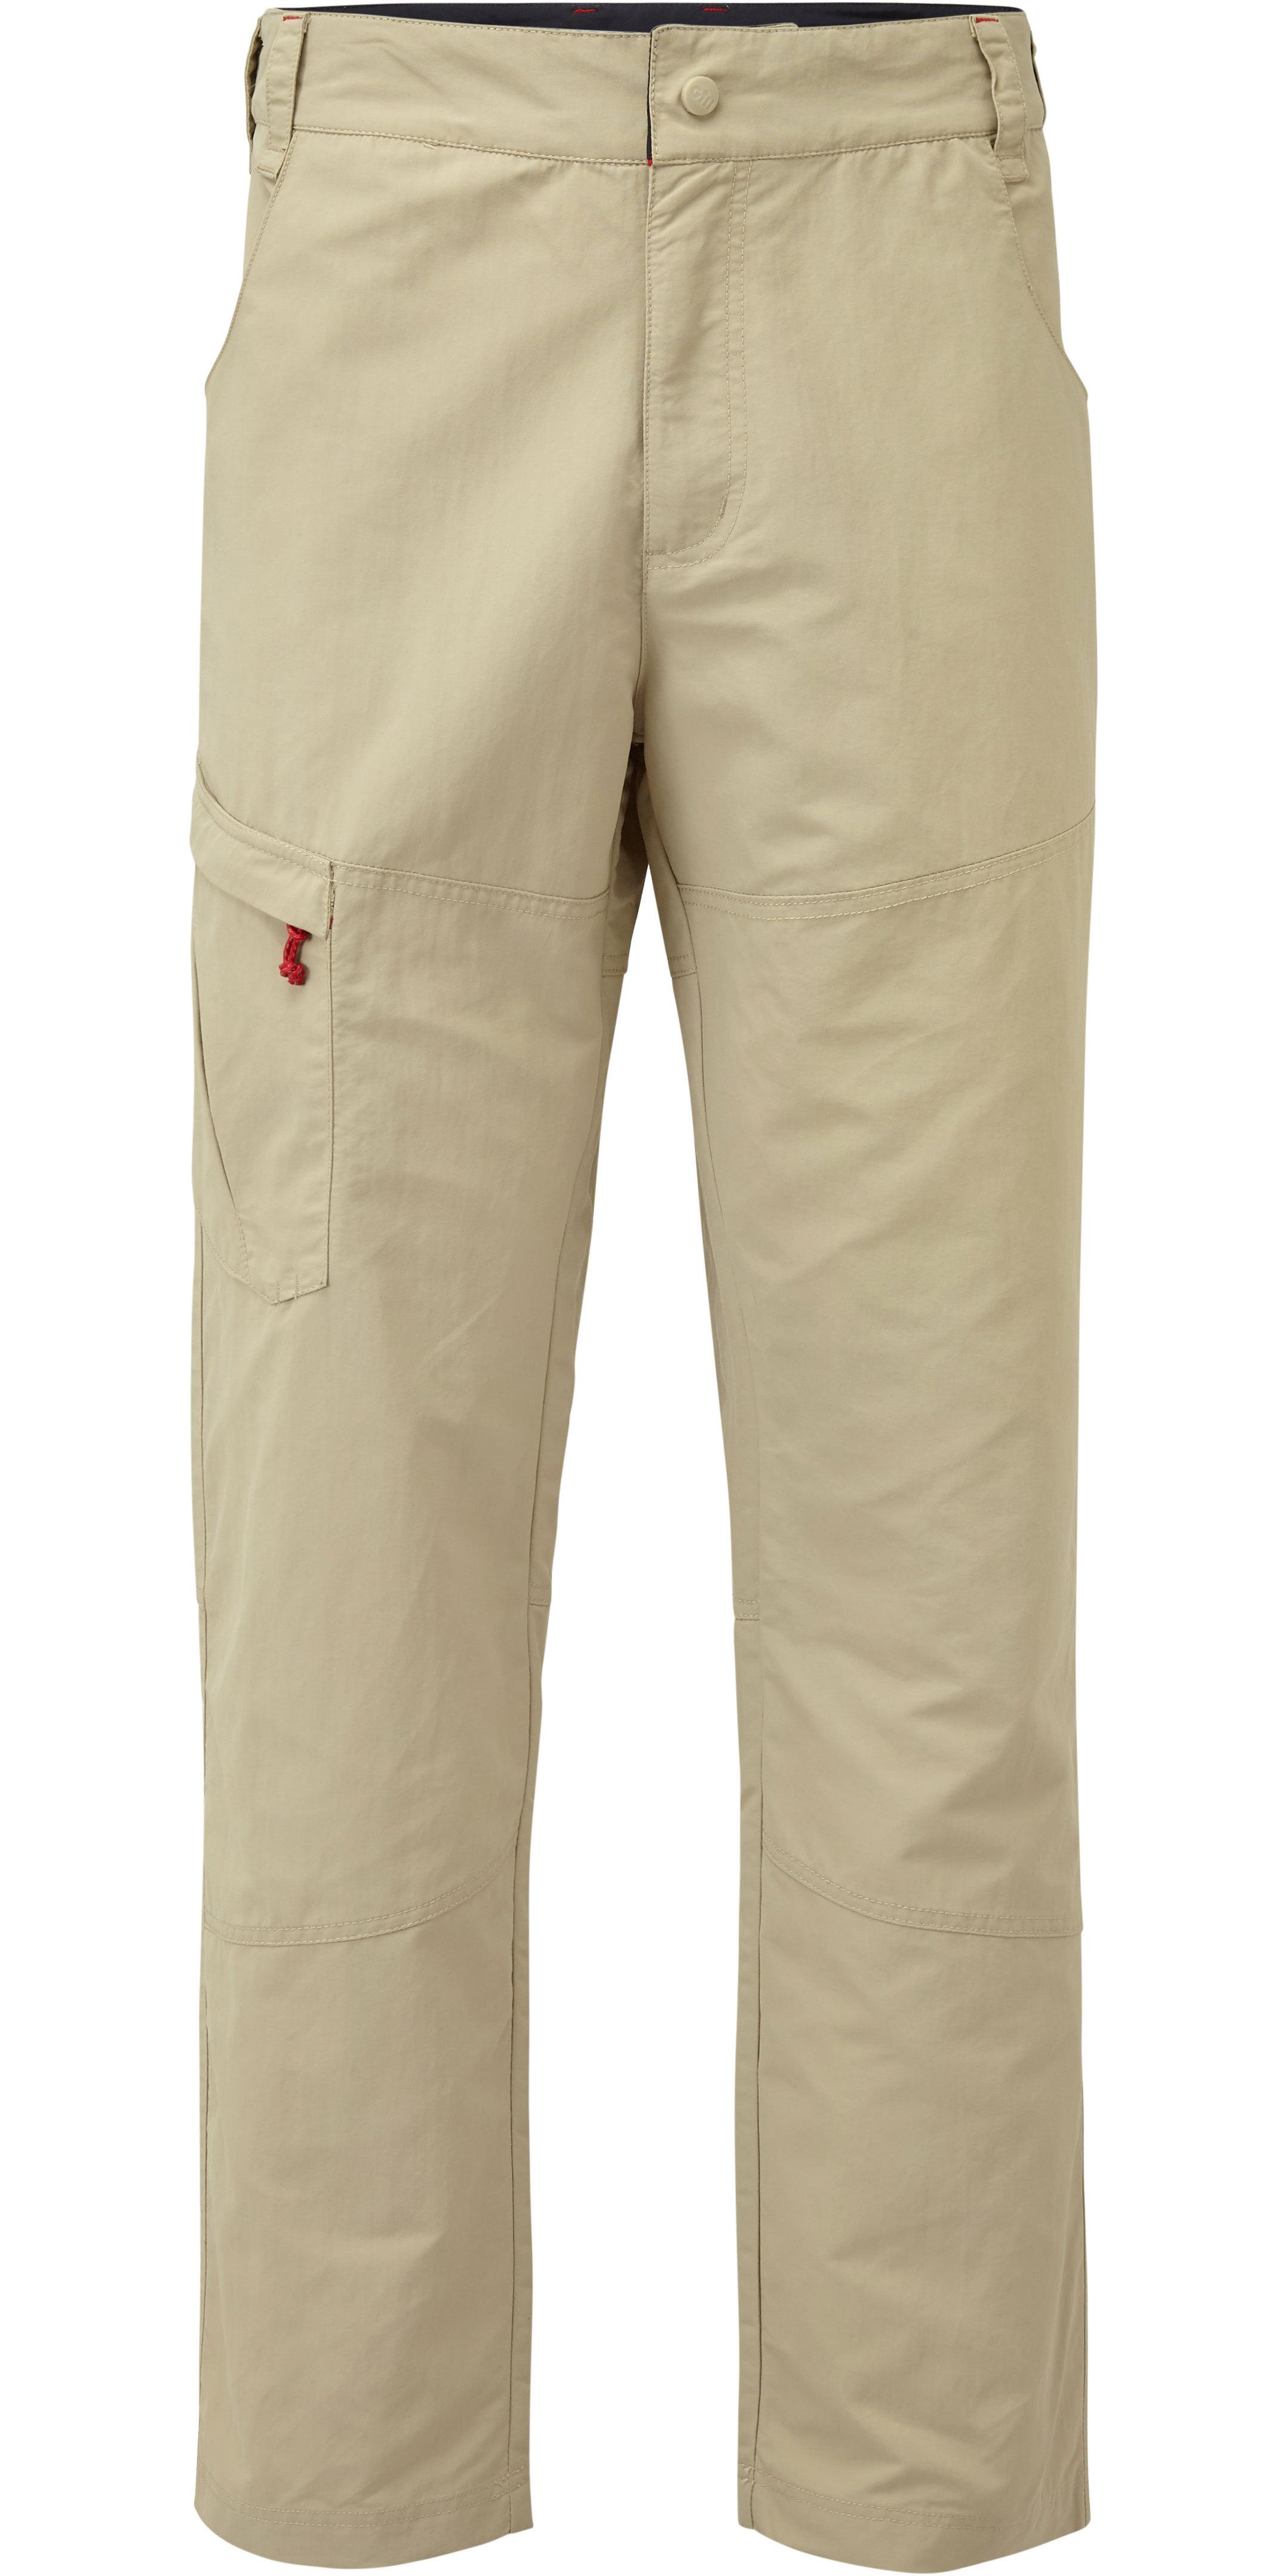 2019 Gill Mens UV Tec Trousers Khaki UV014